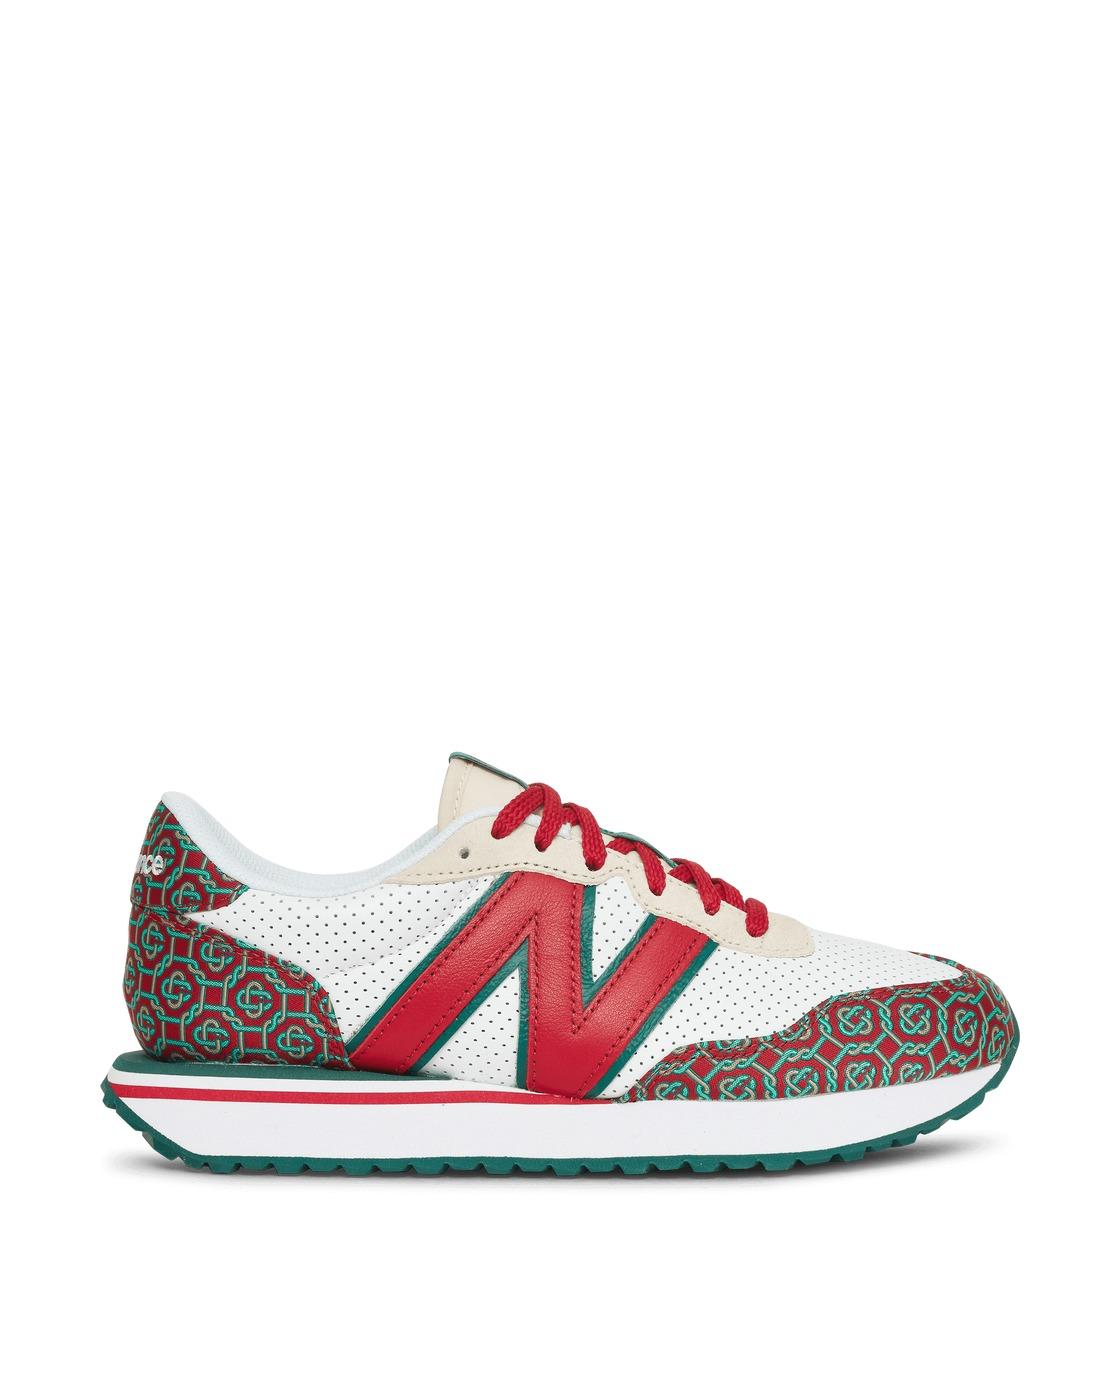 Photo: New Balance Casablanca 237 Sneakers